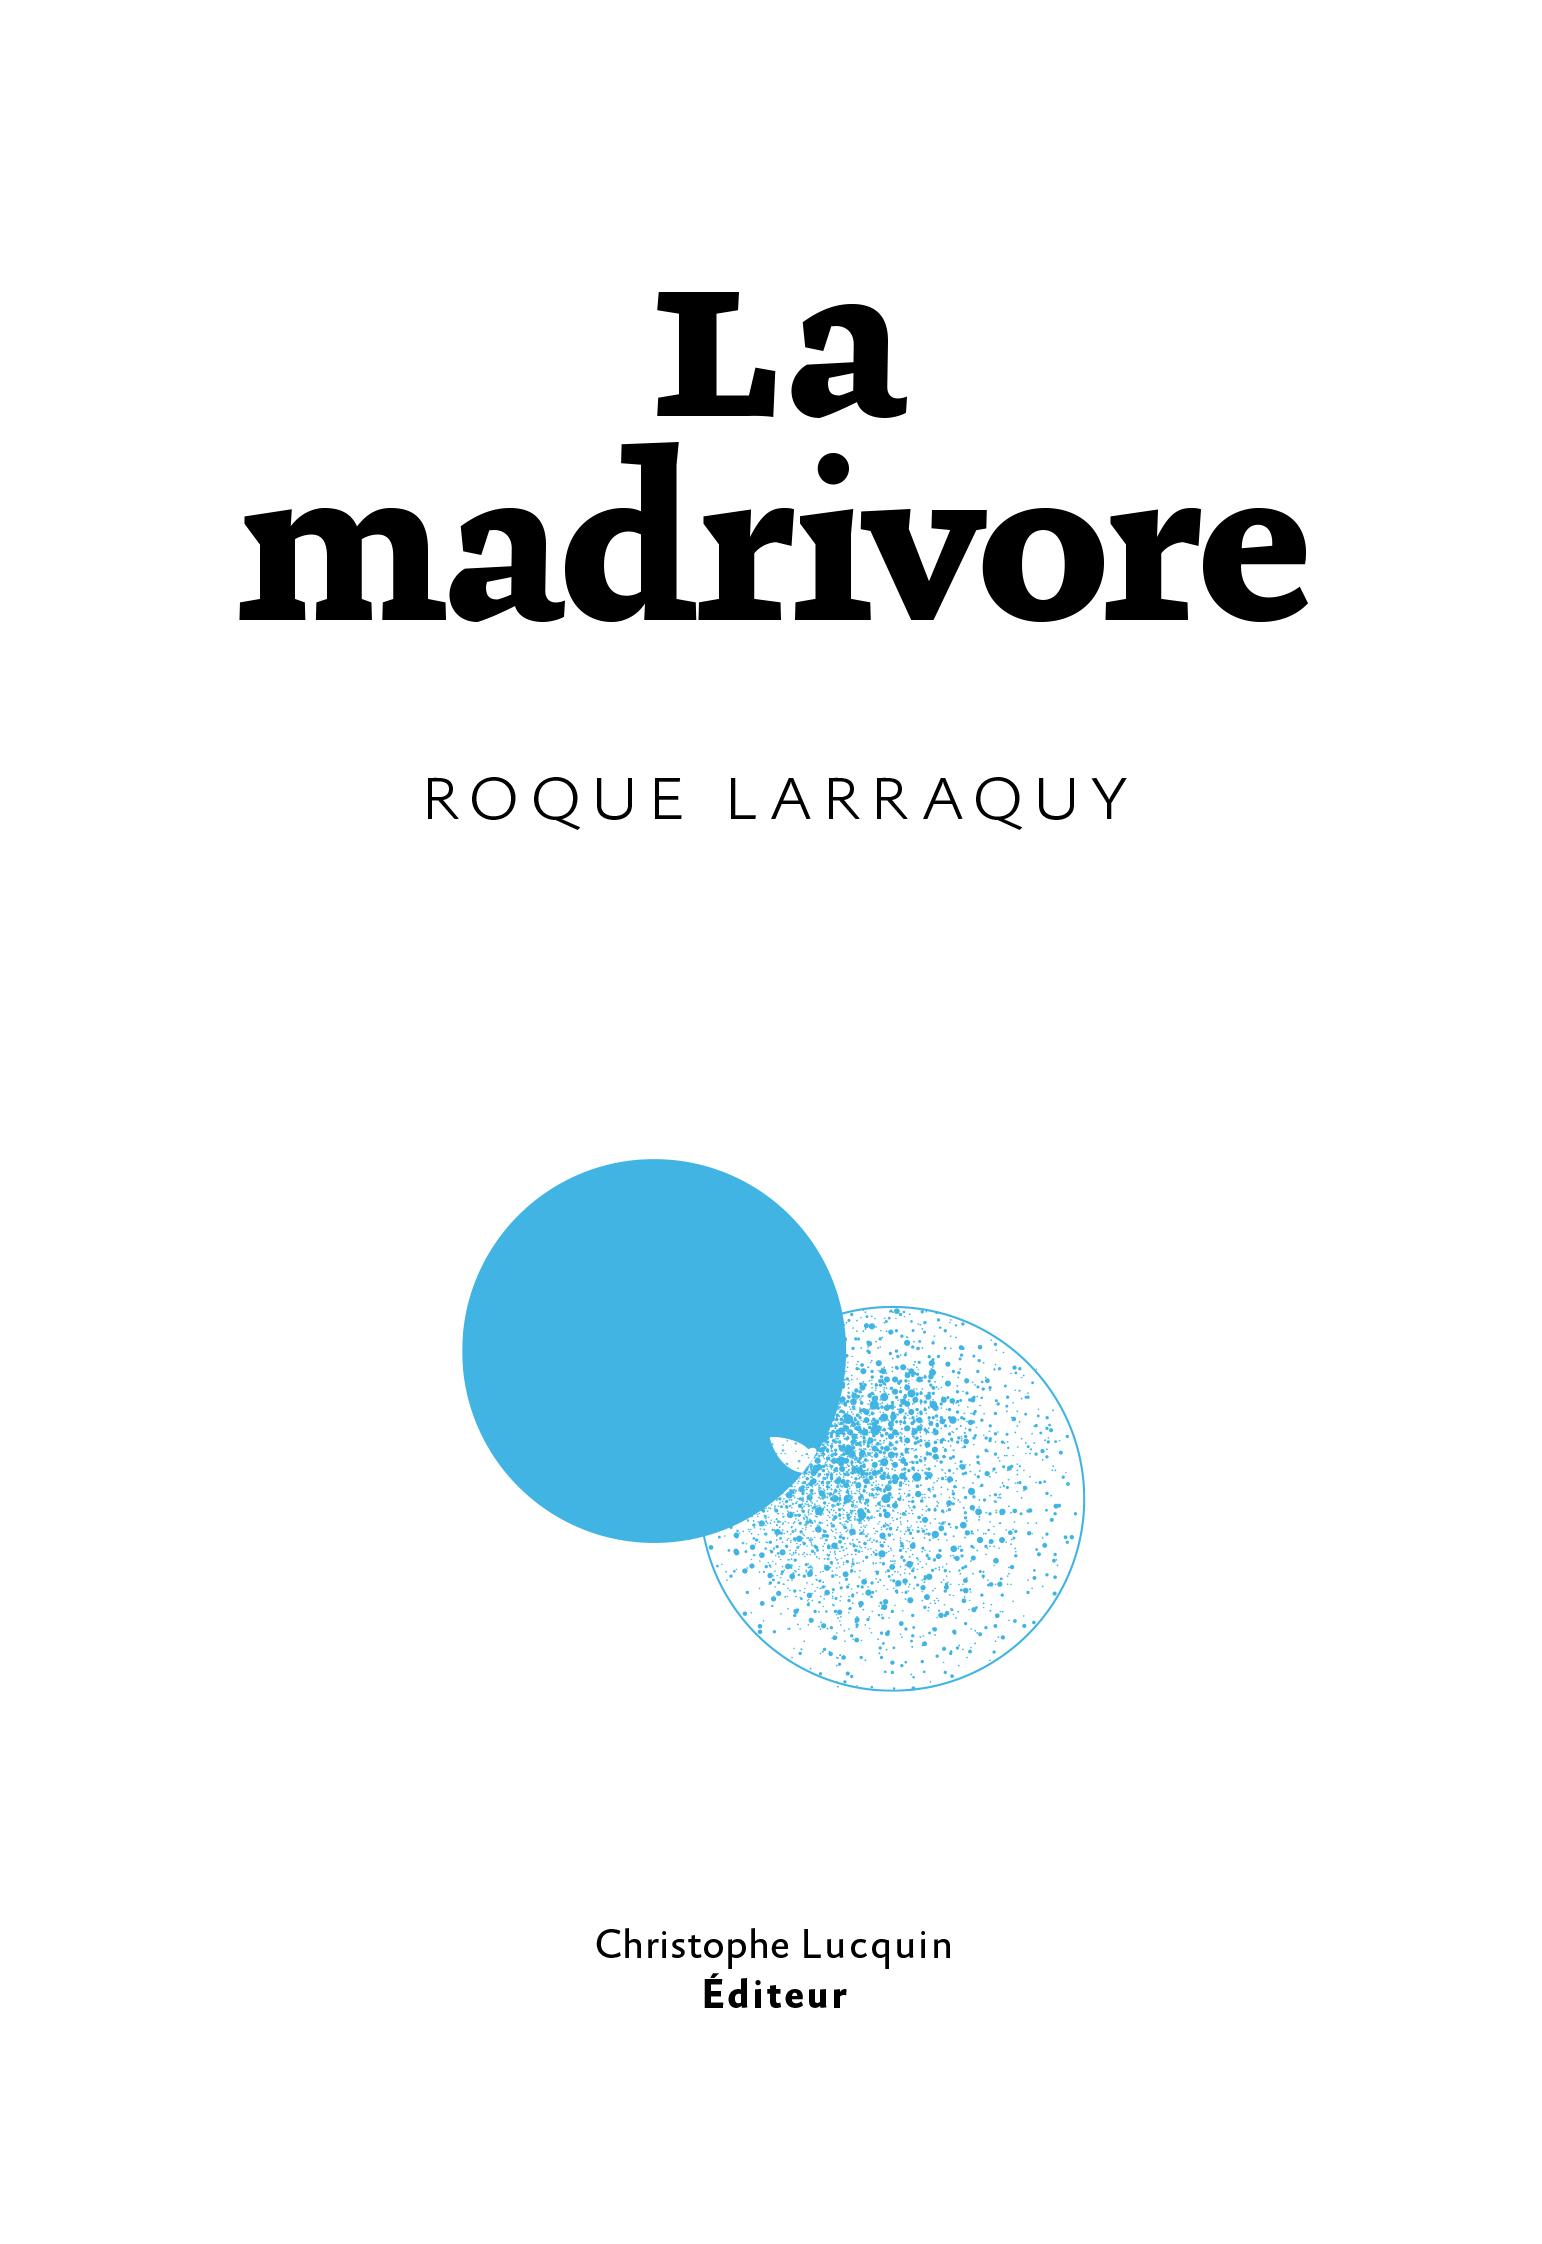 madrivore-HD.jpg